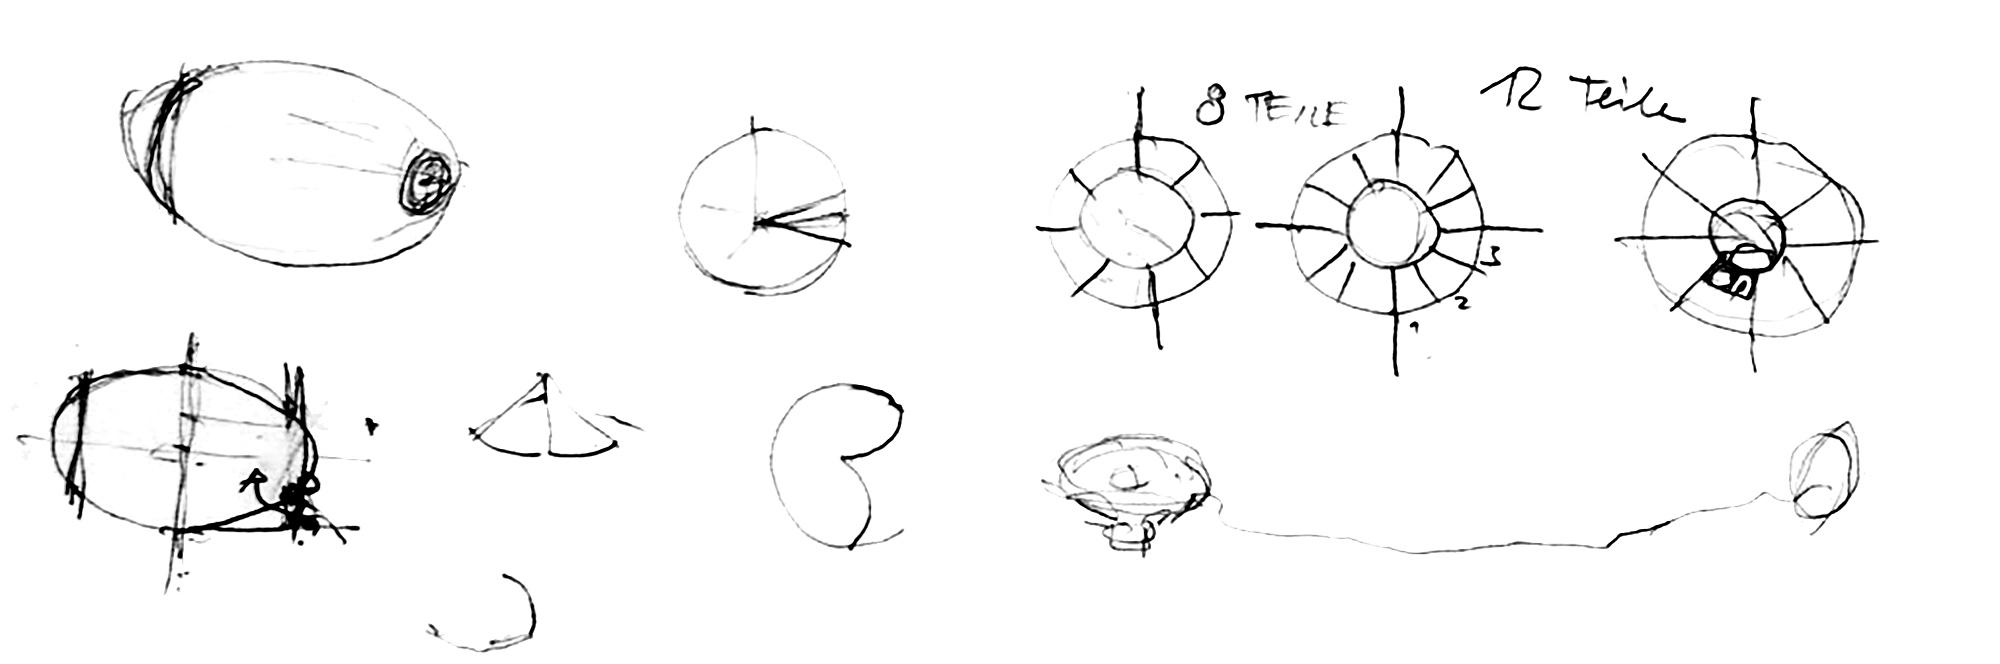 DSC_9017-1024x652 Bodies Drawing 2_CROP